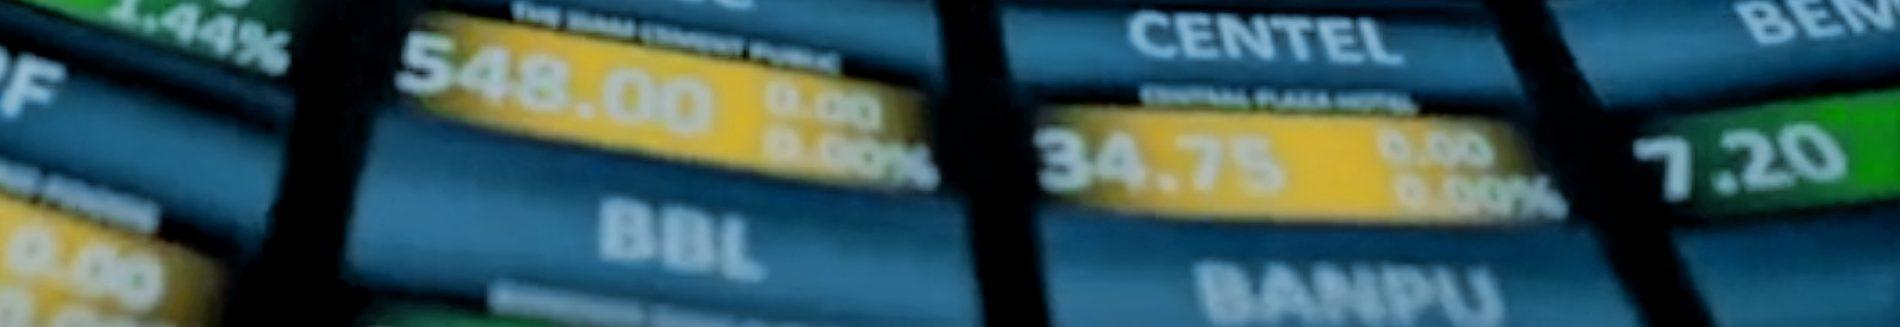 cropped-setvideo-1.jpg